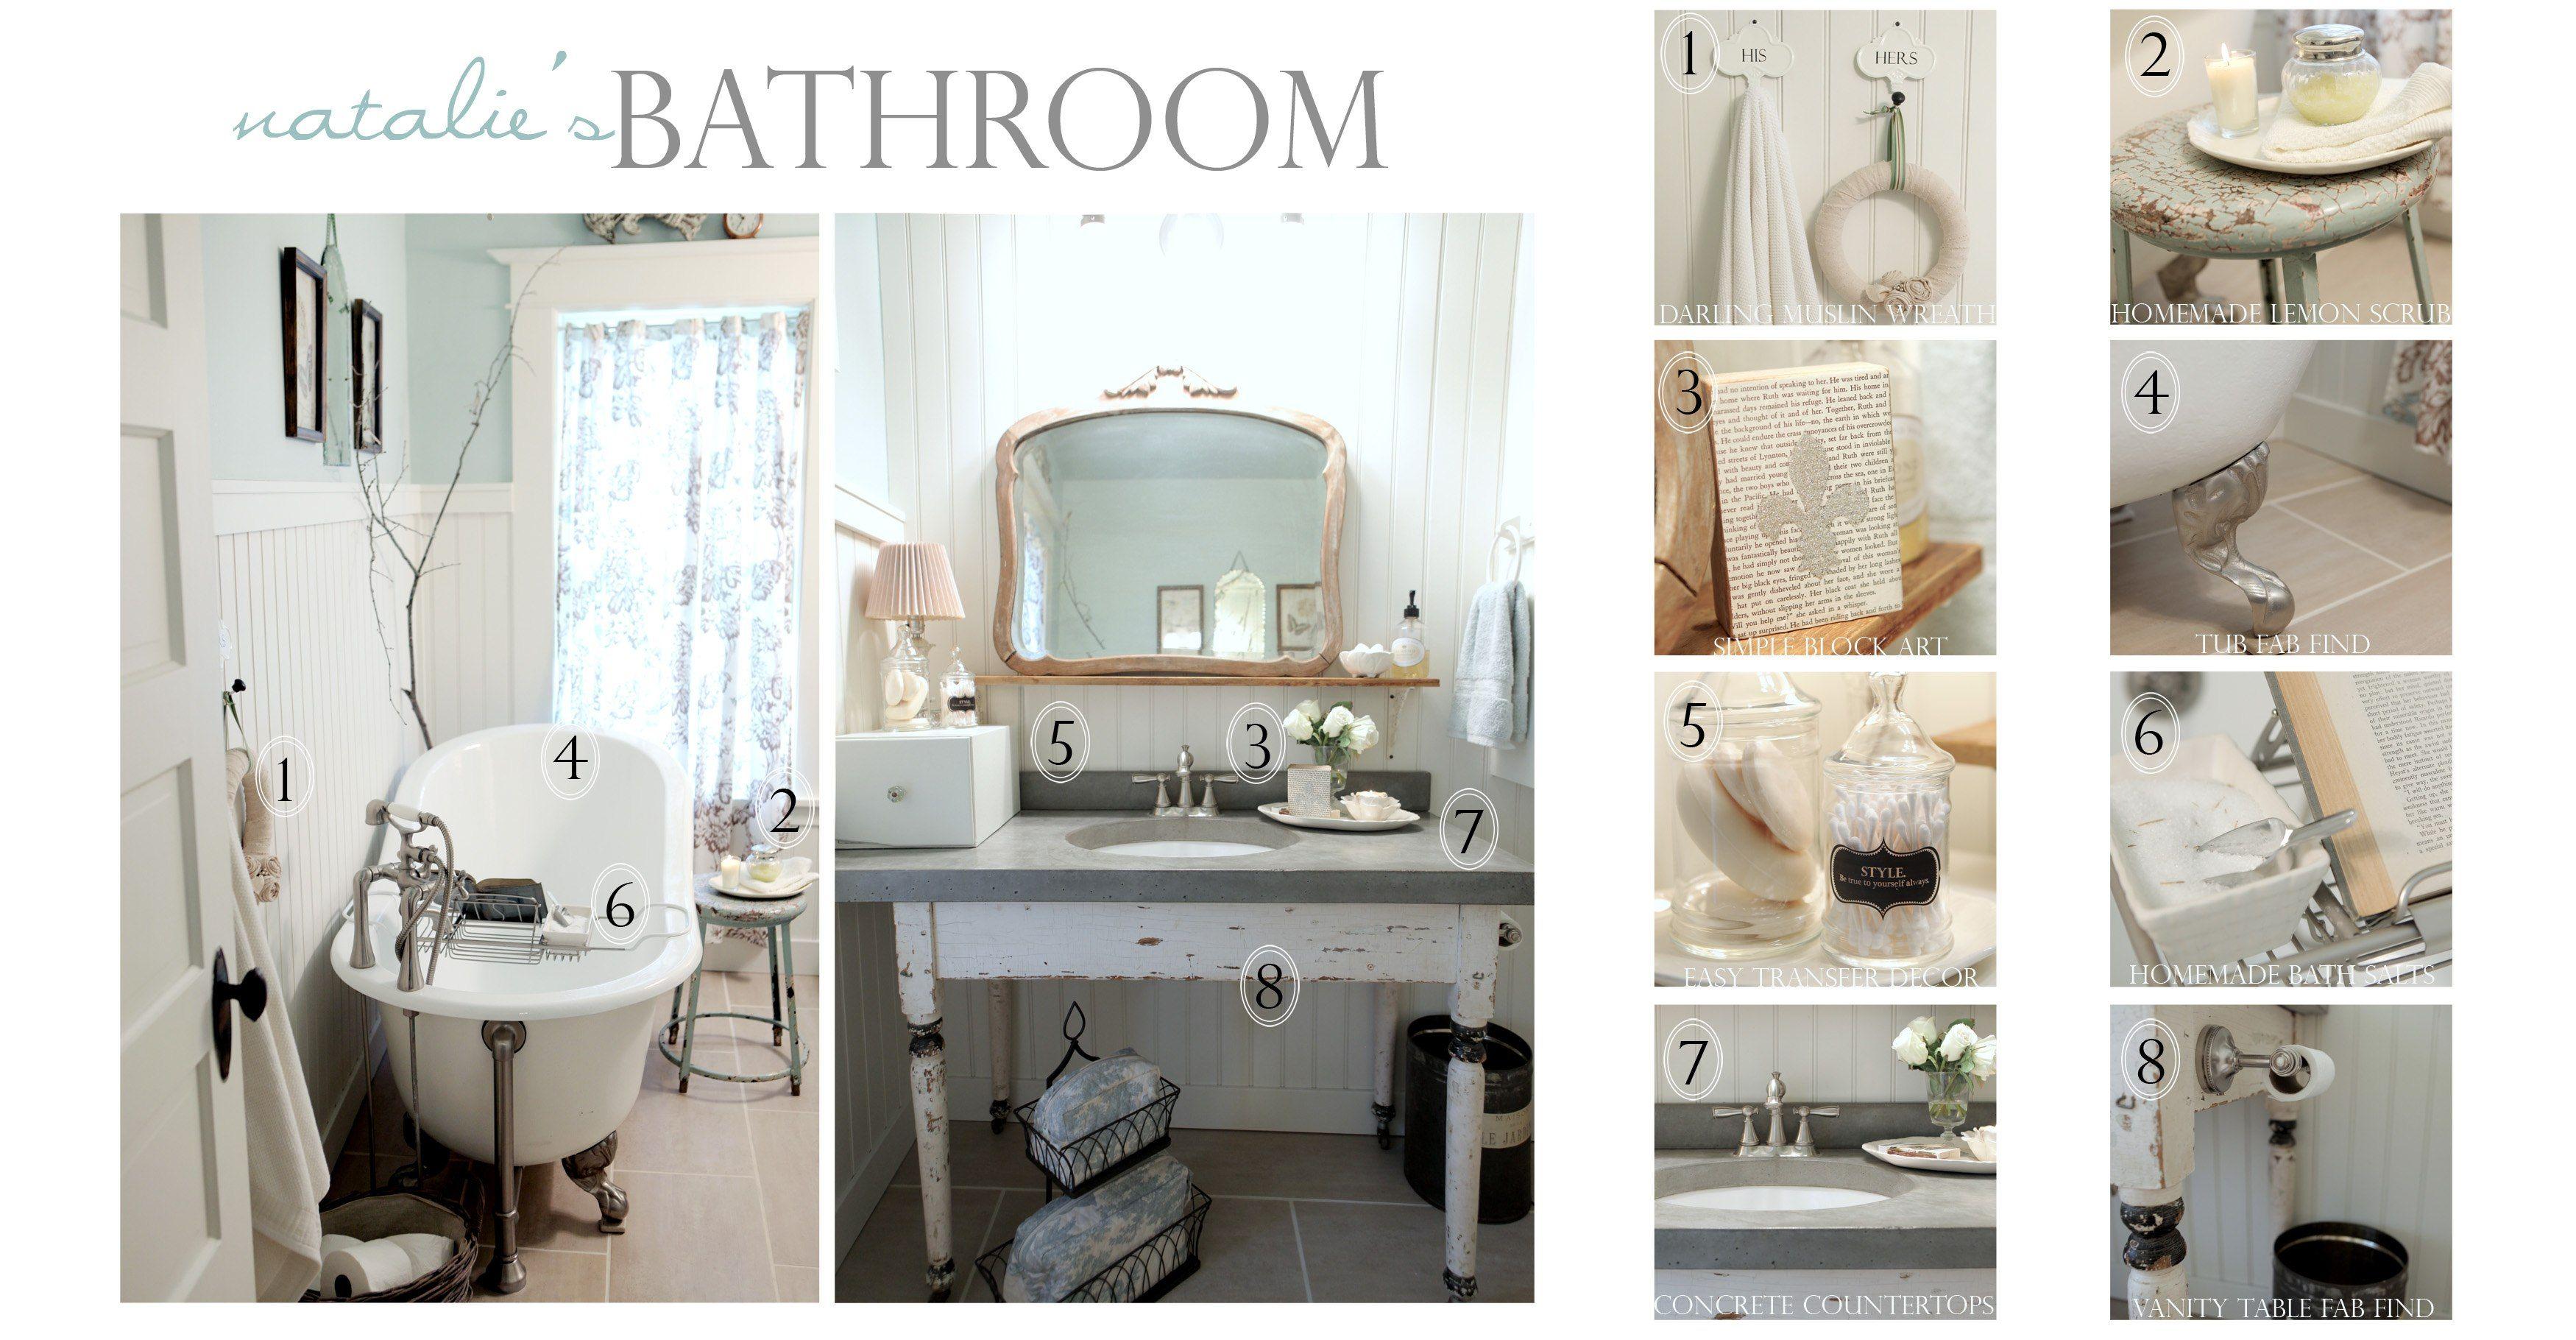 Add Glamour With Small Vintage Bathroom Ideas   ev dekor   Pinterest ...